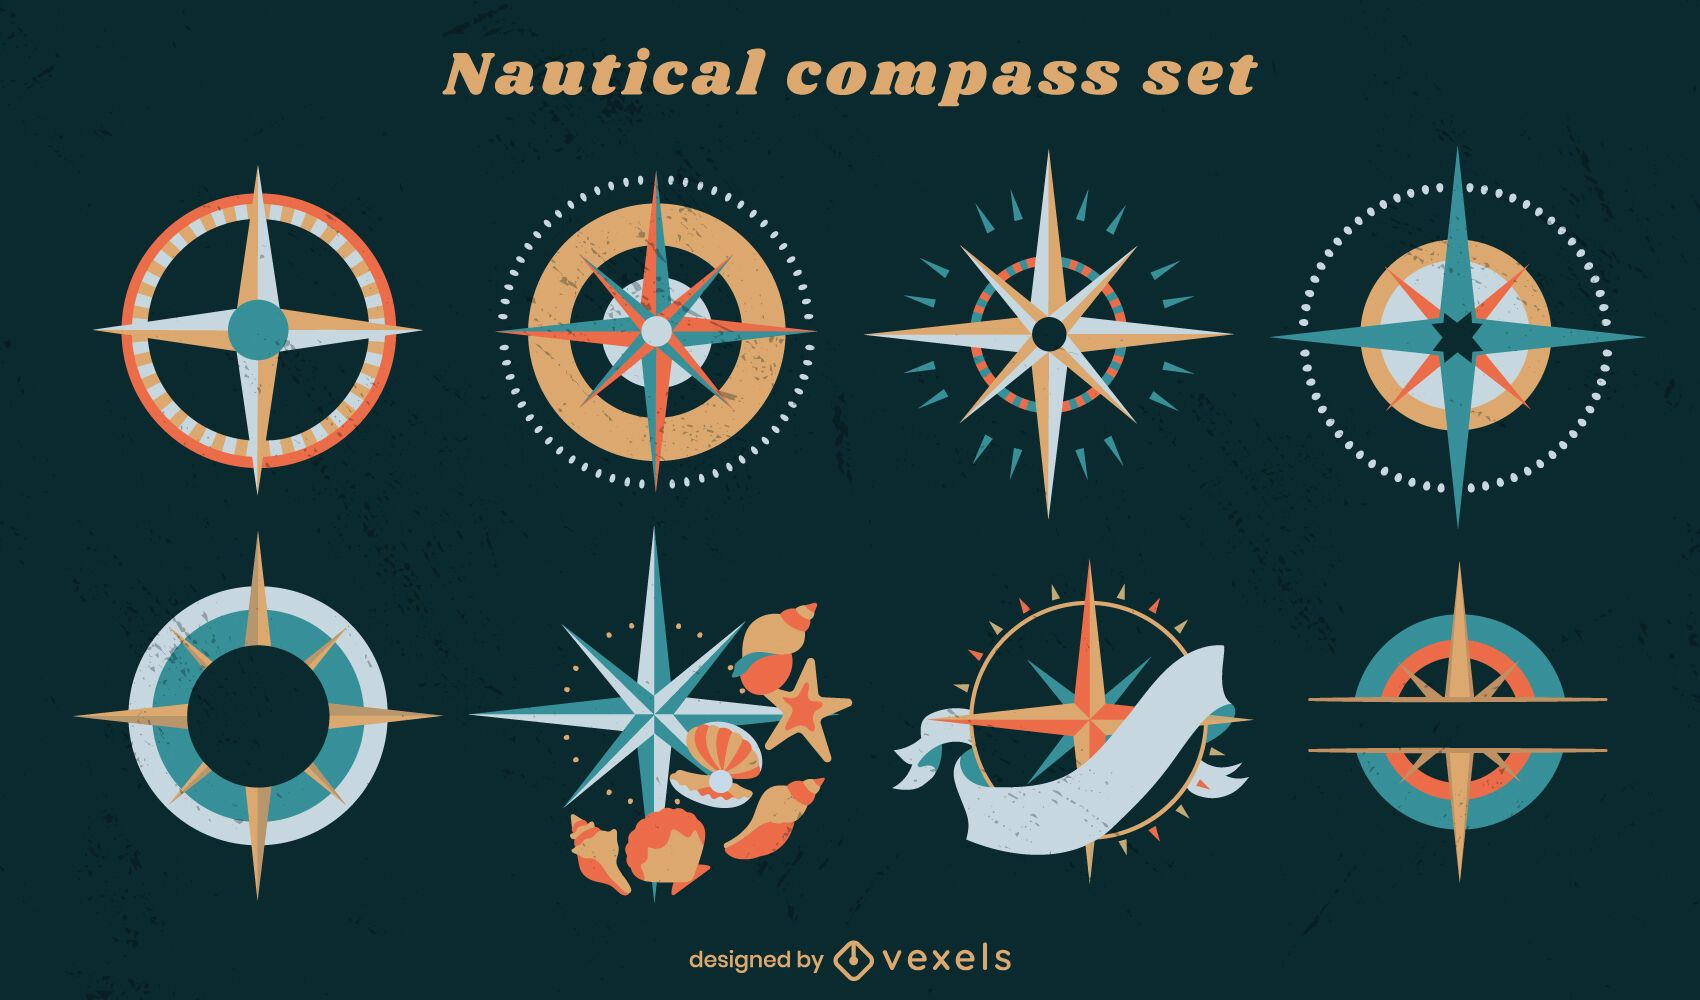 Conjunto de elementos de guia marítimo de bússola náutica